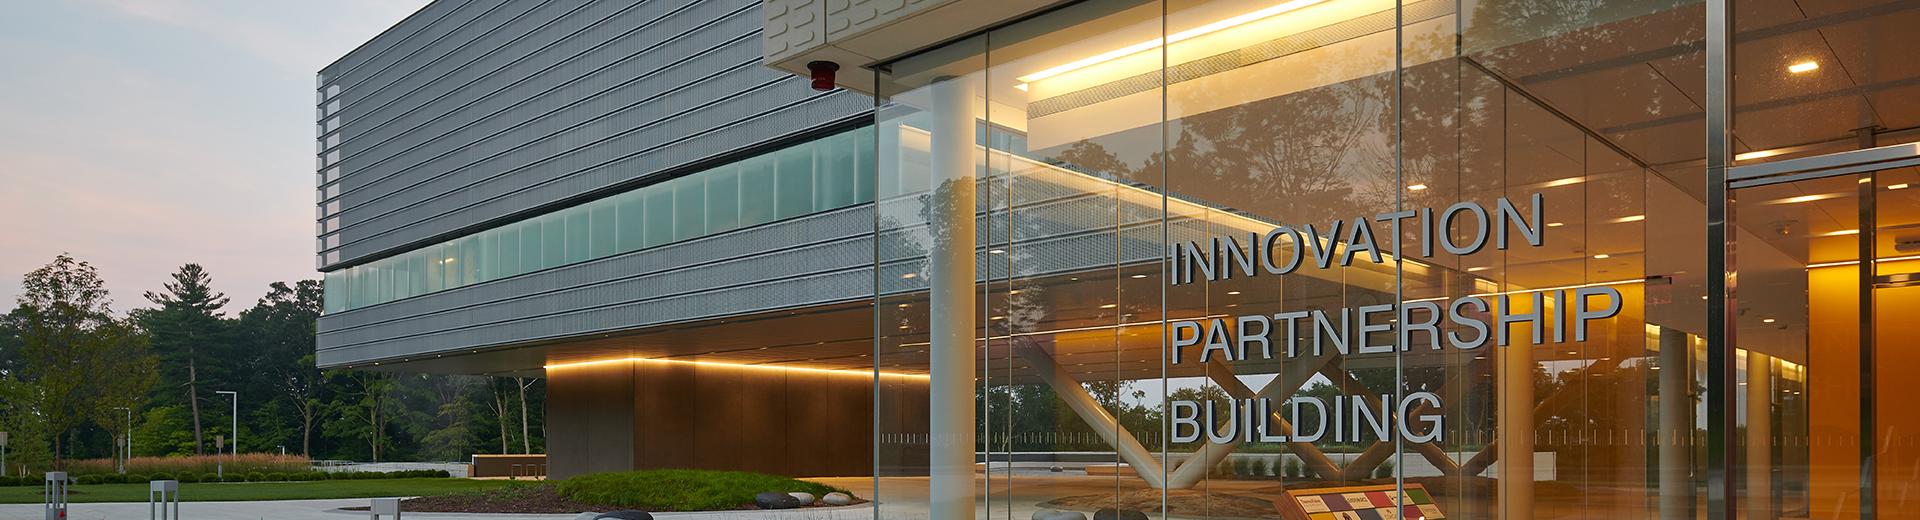 ipb exterior shot